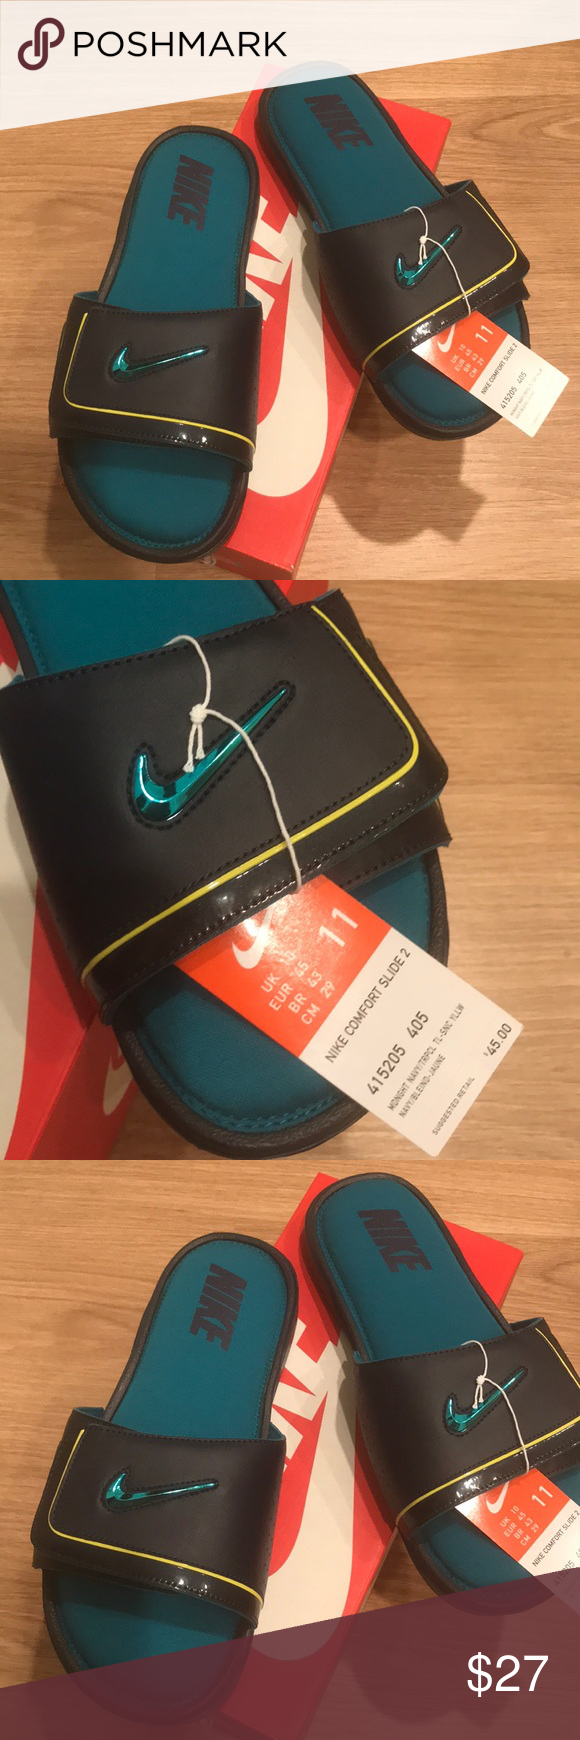 comforter comfort sandals koa shoeblack lt olukai men ohana slide arkot shoe black p nike